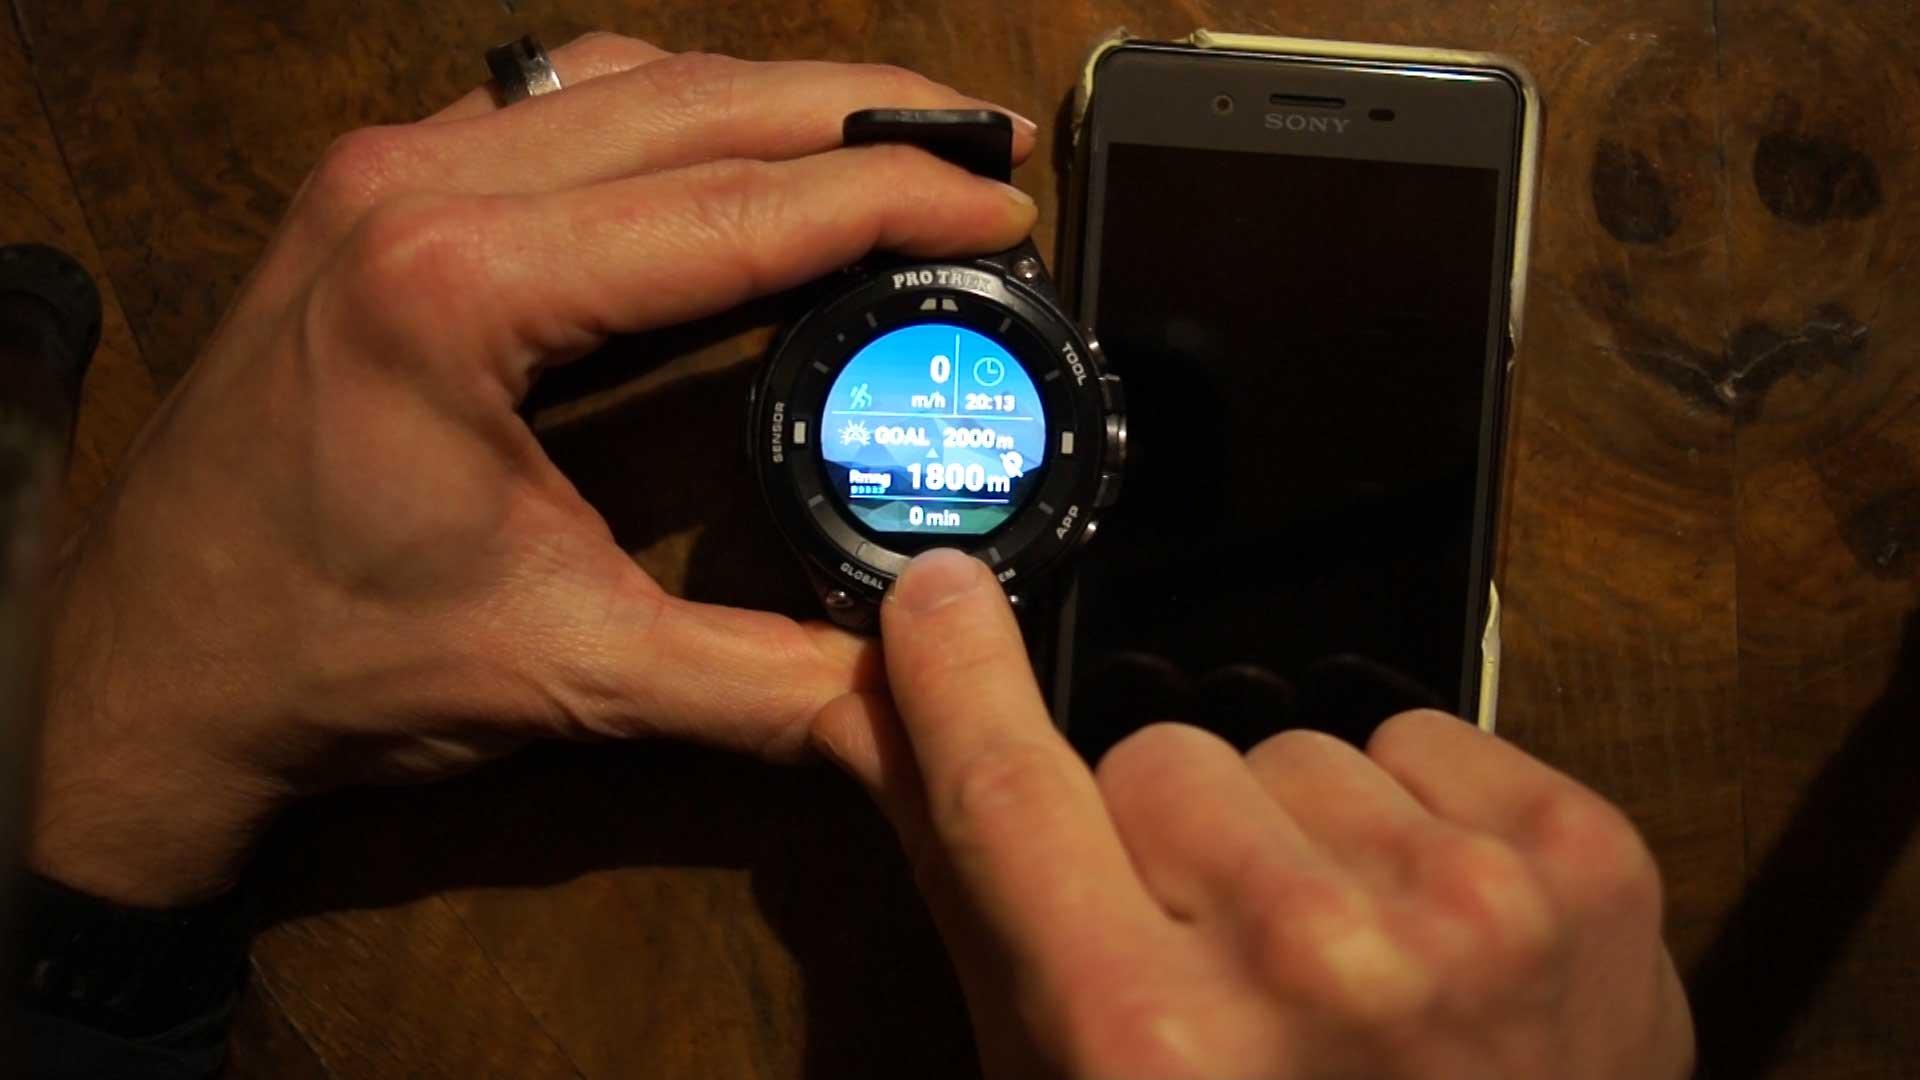 The Casio Protrek Smart Wsd F20 Casio Apps Tool Activity